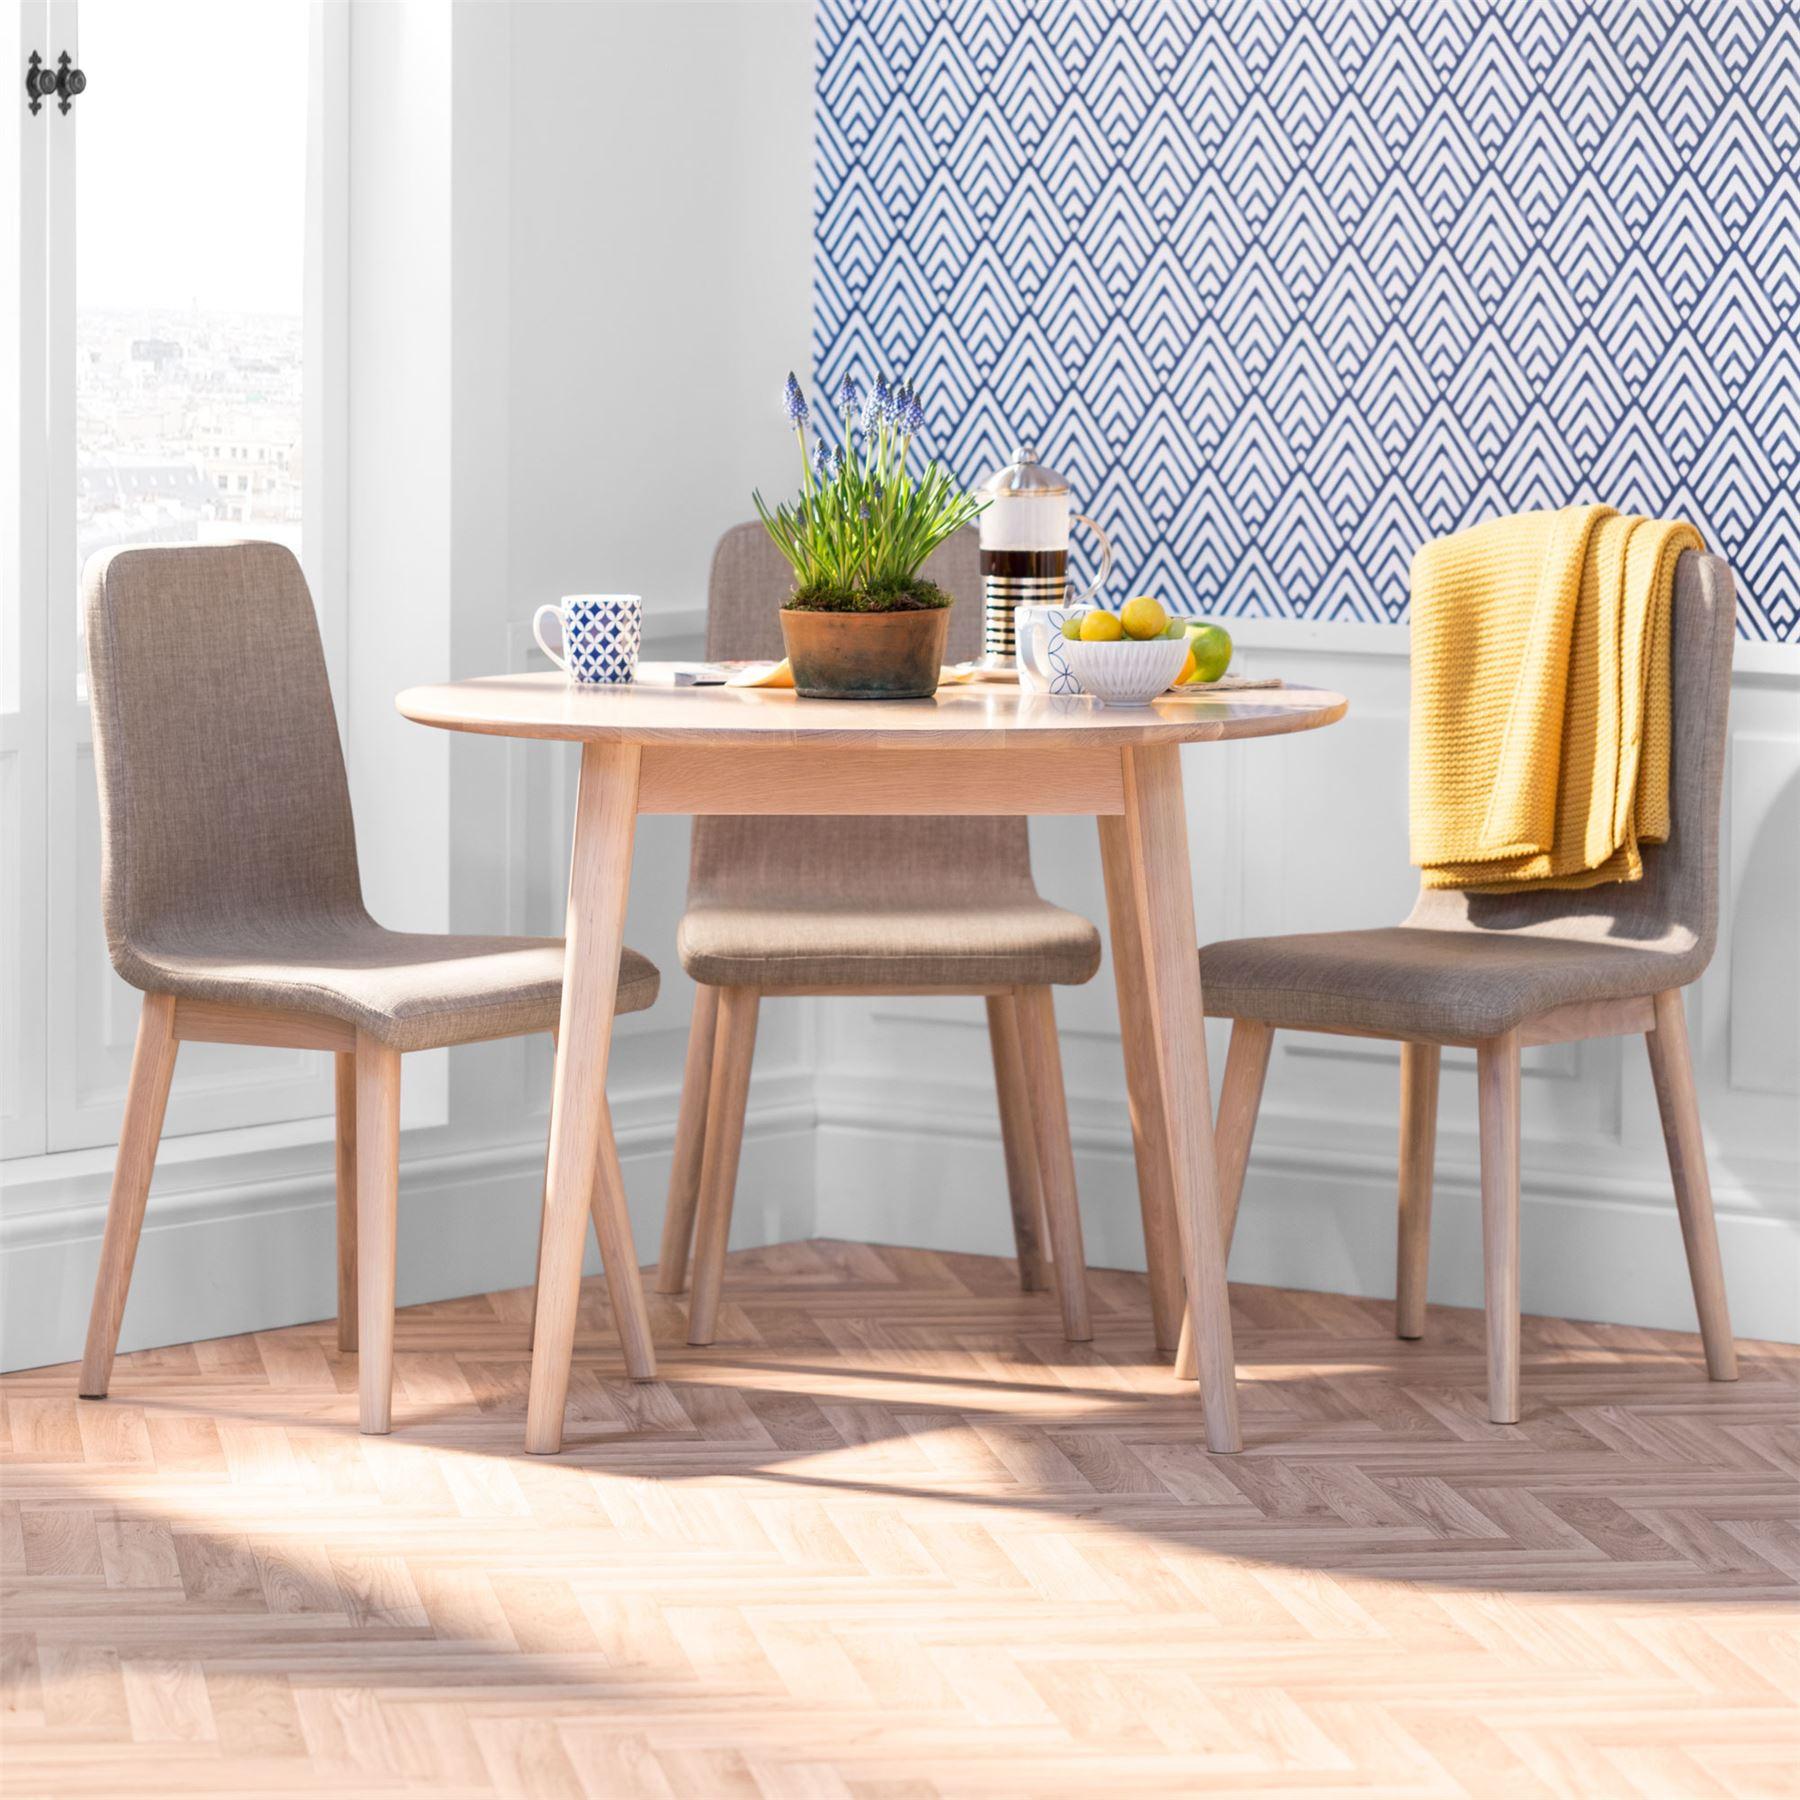 Marvelous Edvard Olsen Oak Round Table Light Oak Kitchen Table Complete Home Design Collection Lindsey Bellcom